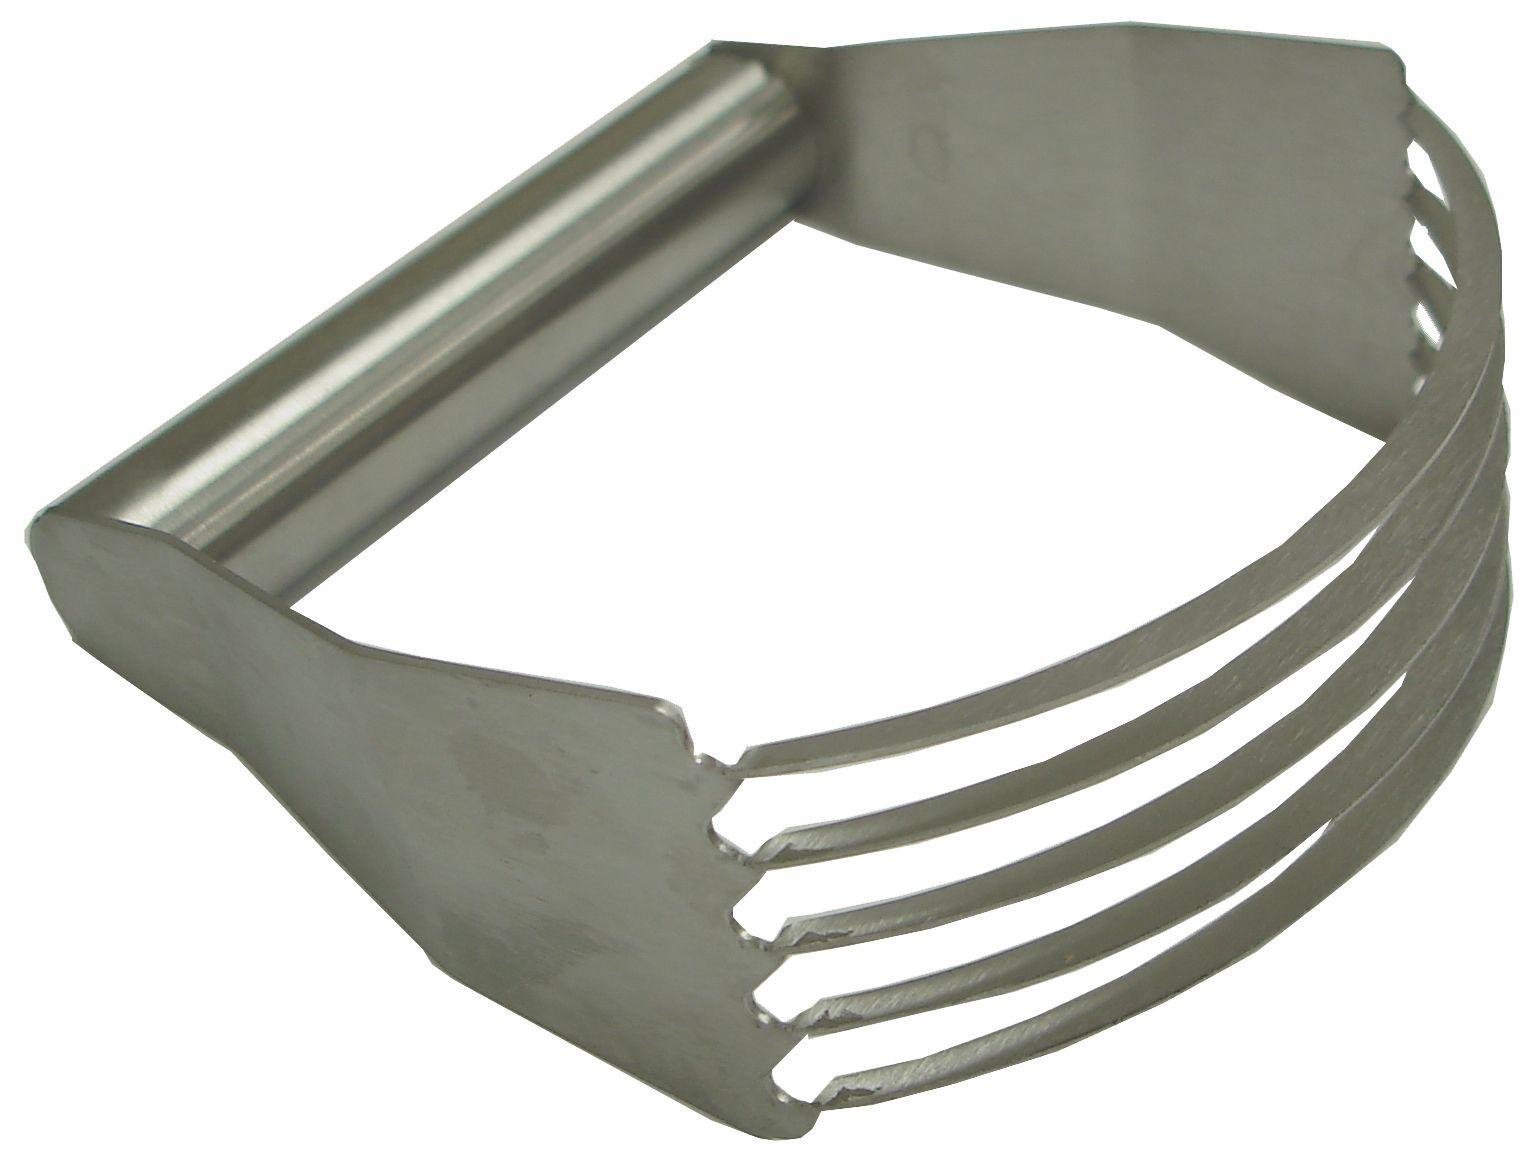 Winco PST-5B Stainless Steel 5-Blade Pastry Blender